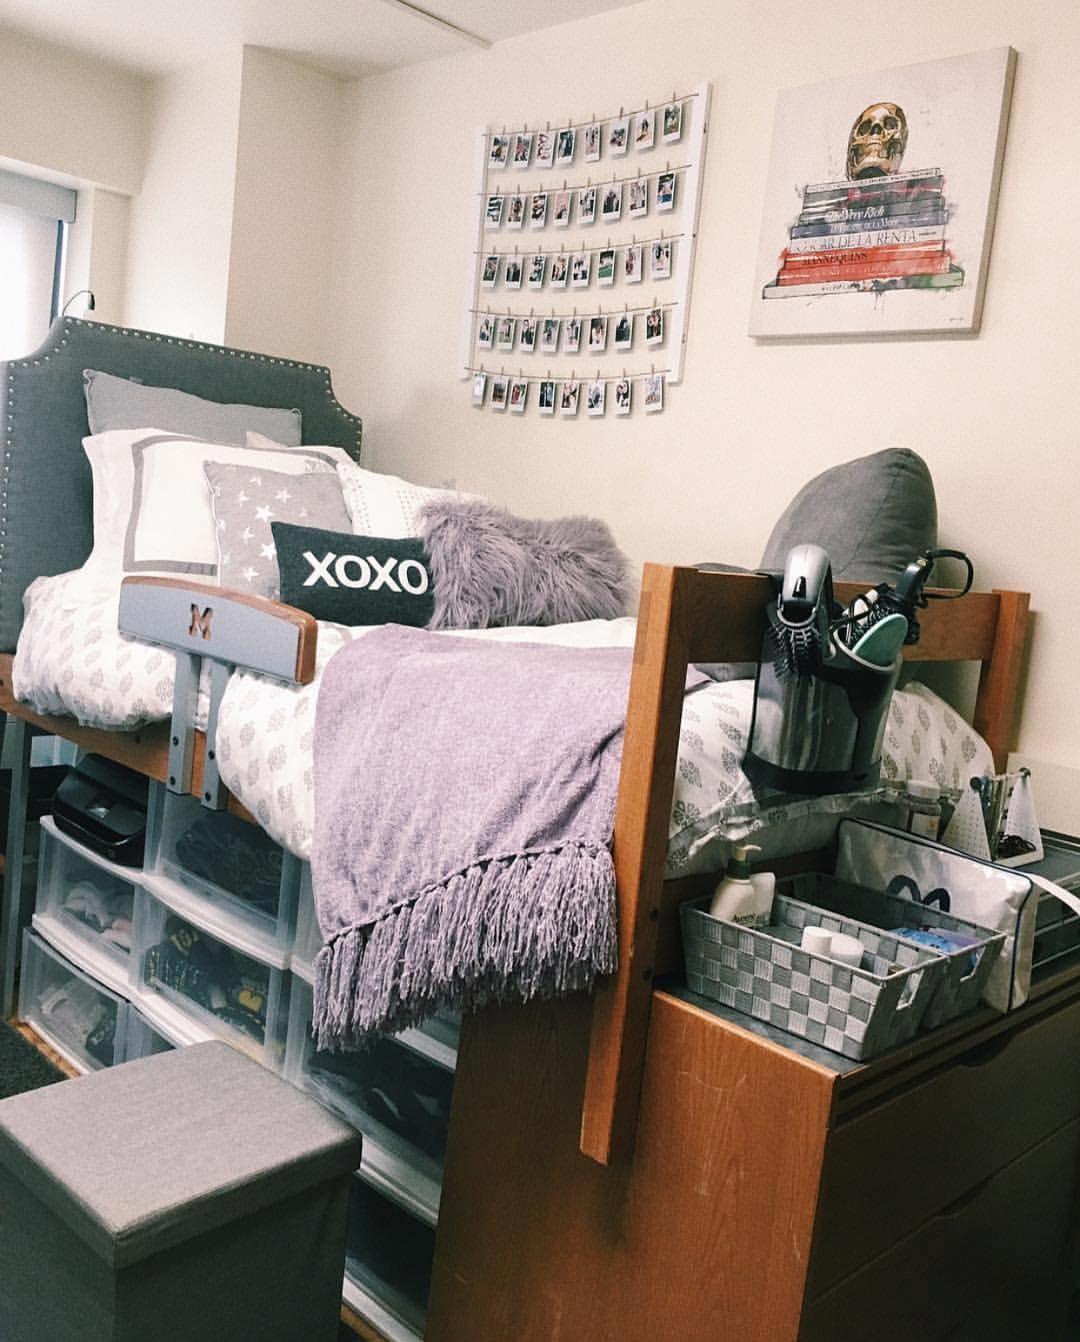 Dorm rooms at harvard  likes  comments  dormify on instagram ucxoxo ldw last